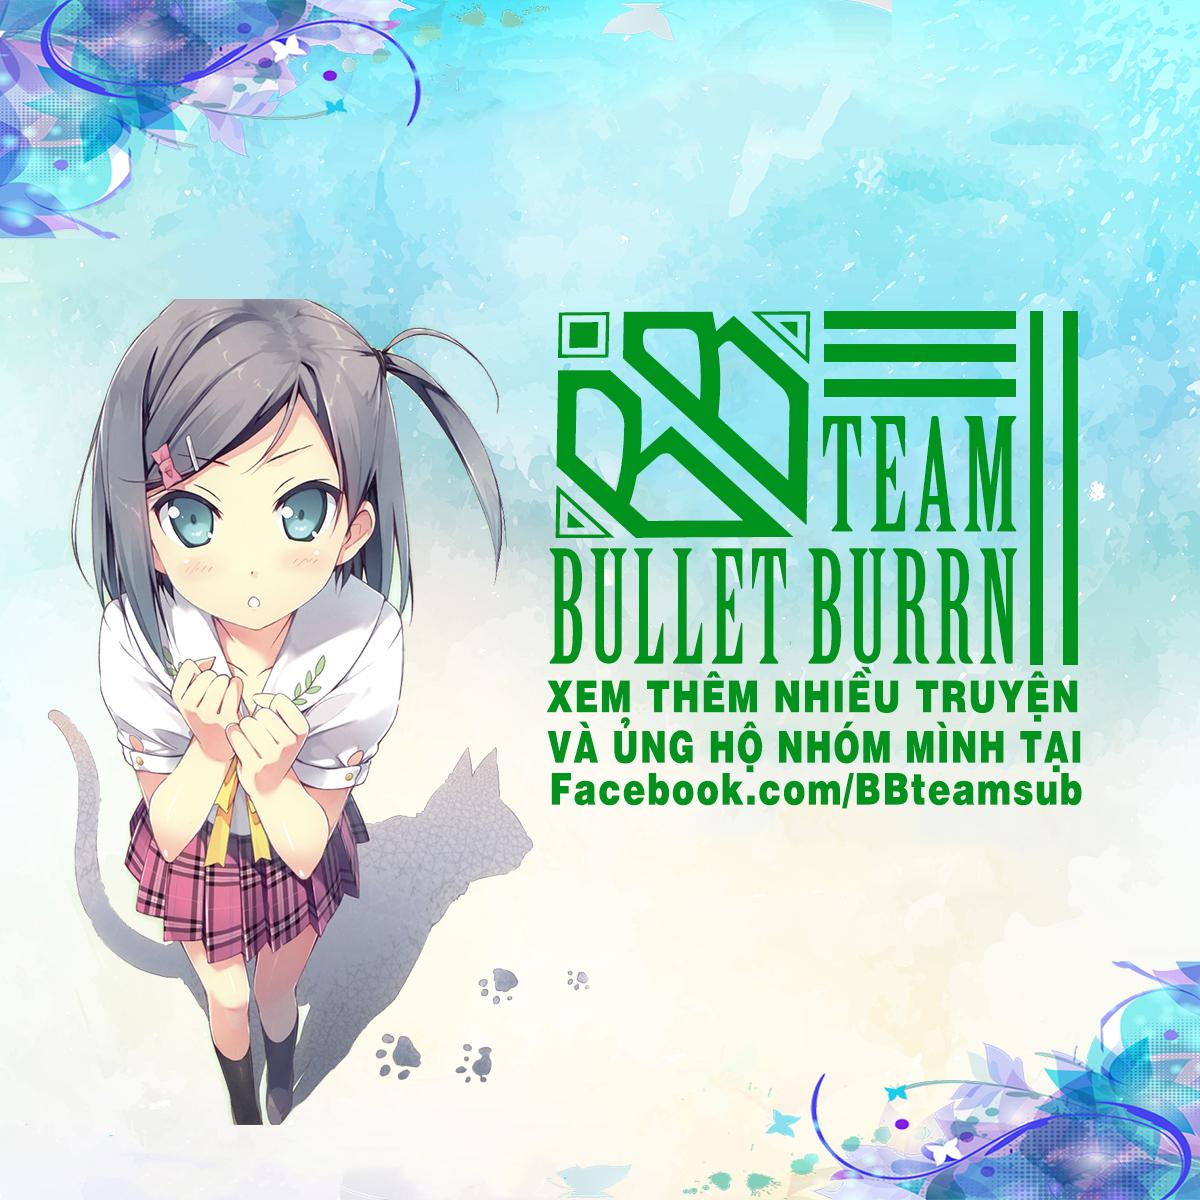 HentaiVN.net - Ảnh 1 - Muchi Homo Kanojo - My Best (Girl) Friend is an Ignorant Homo - Oneshot